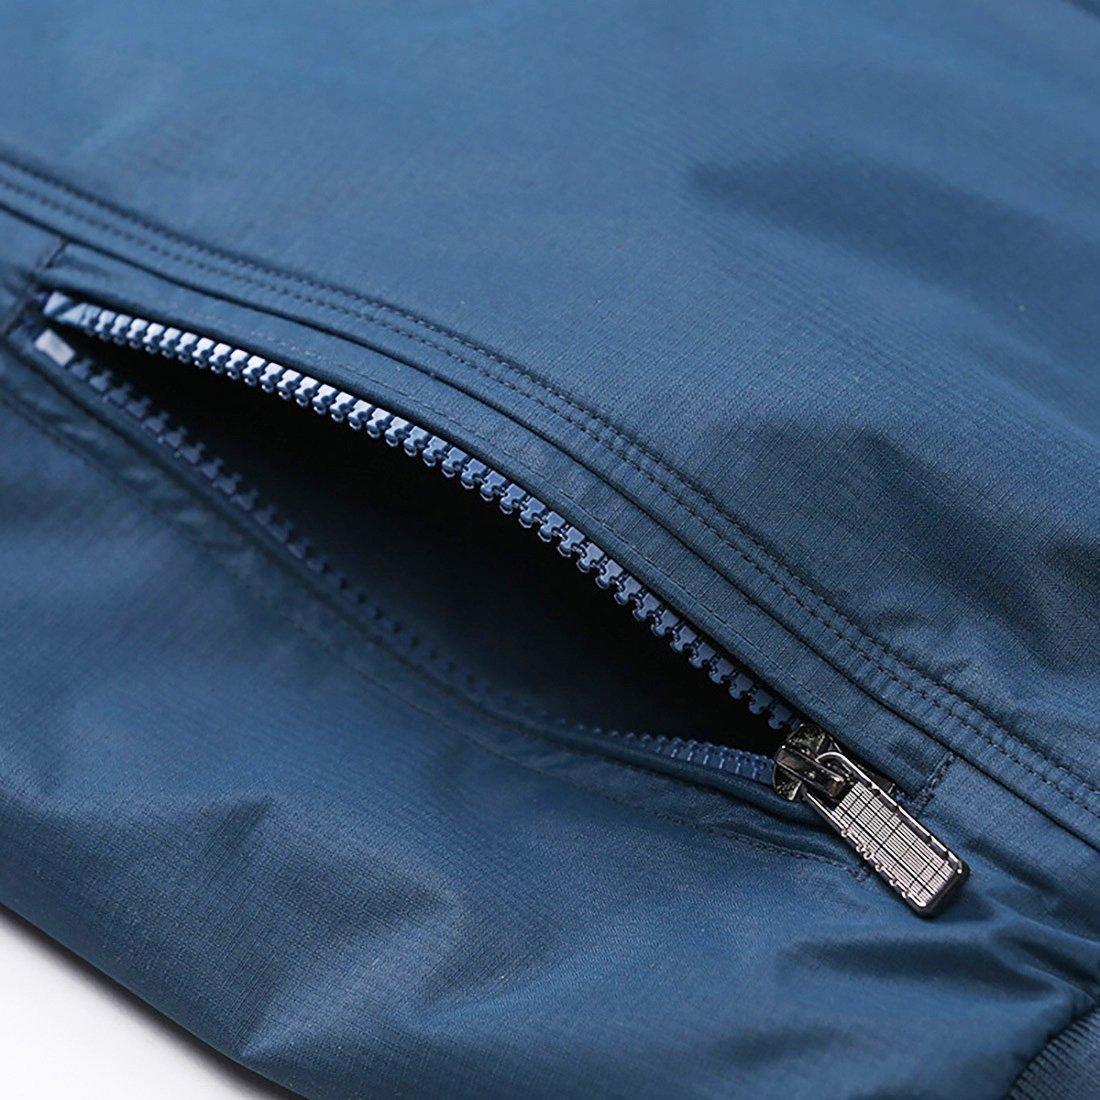 Nantersan Mens Casual Jacket Outdoor Sportswear Windbreaker Lightweight Bomber Jackets and Coats